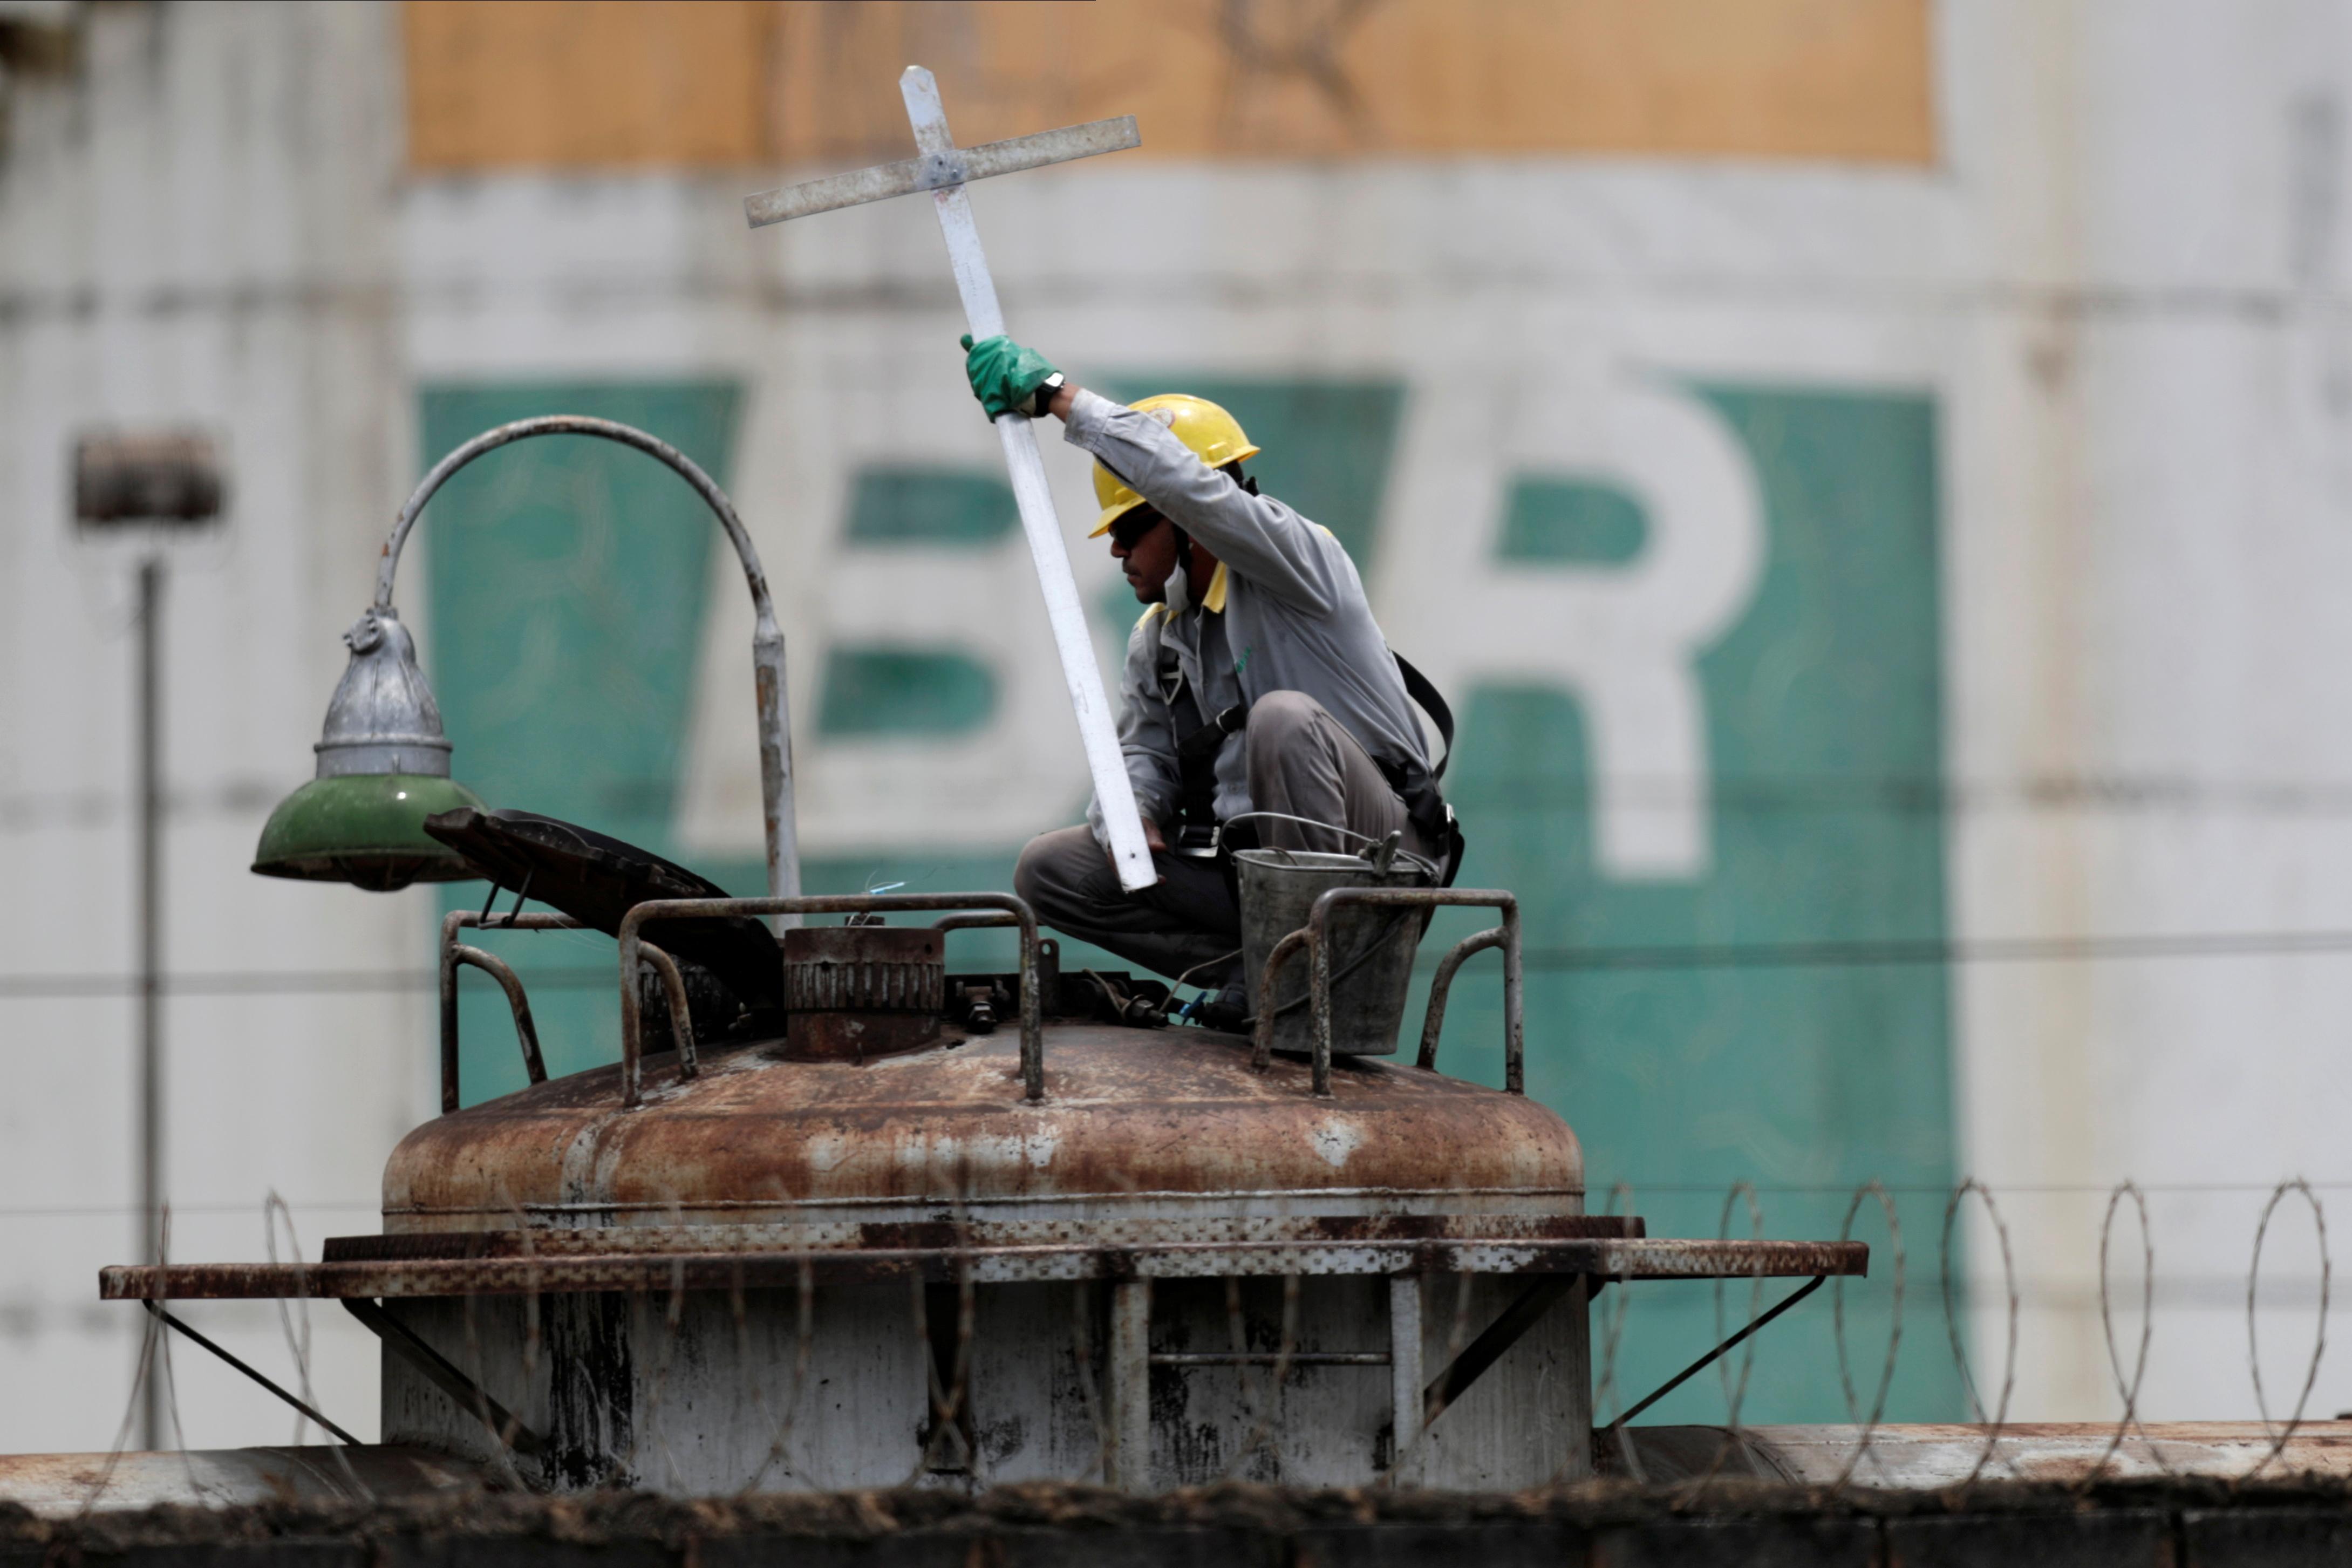 A worker checks the fuel volumes on a train wagon near a tank of Brazil's state-run Petrobras oil company in Brasilia, Brazil, February 19, 2021. REUTERS/Ueslei Marcelino - RC2VVL9V46QF